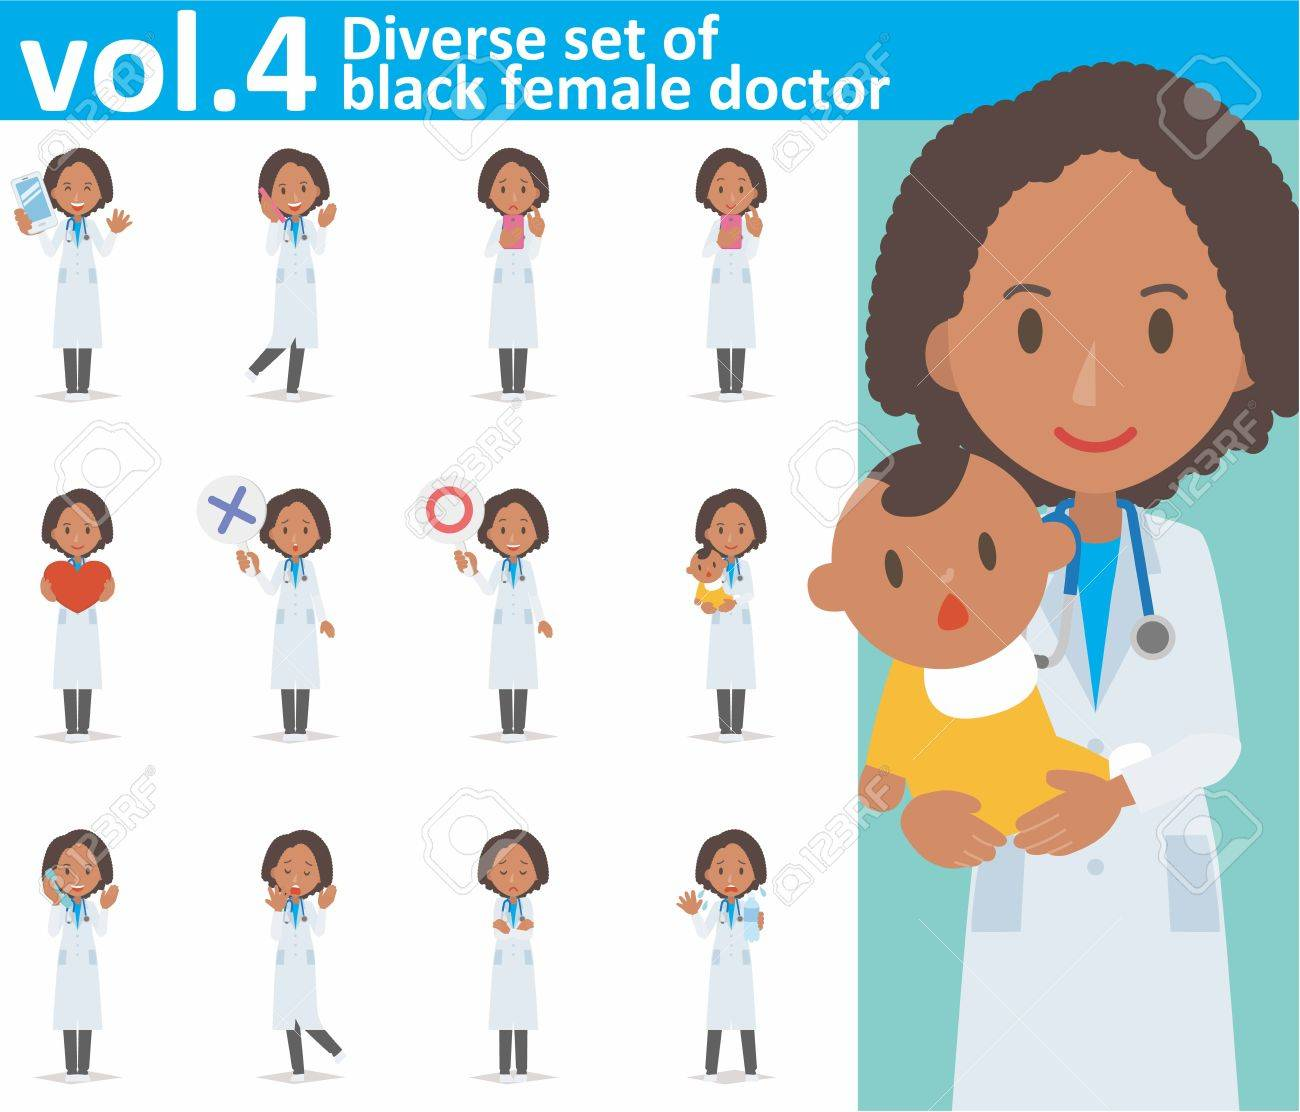 diverse set of black female doctor on white background - 62103381